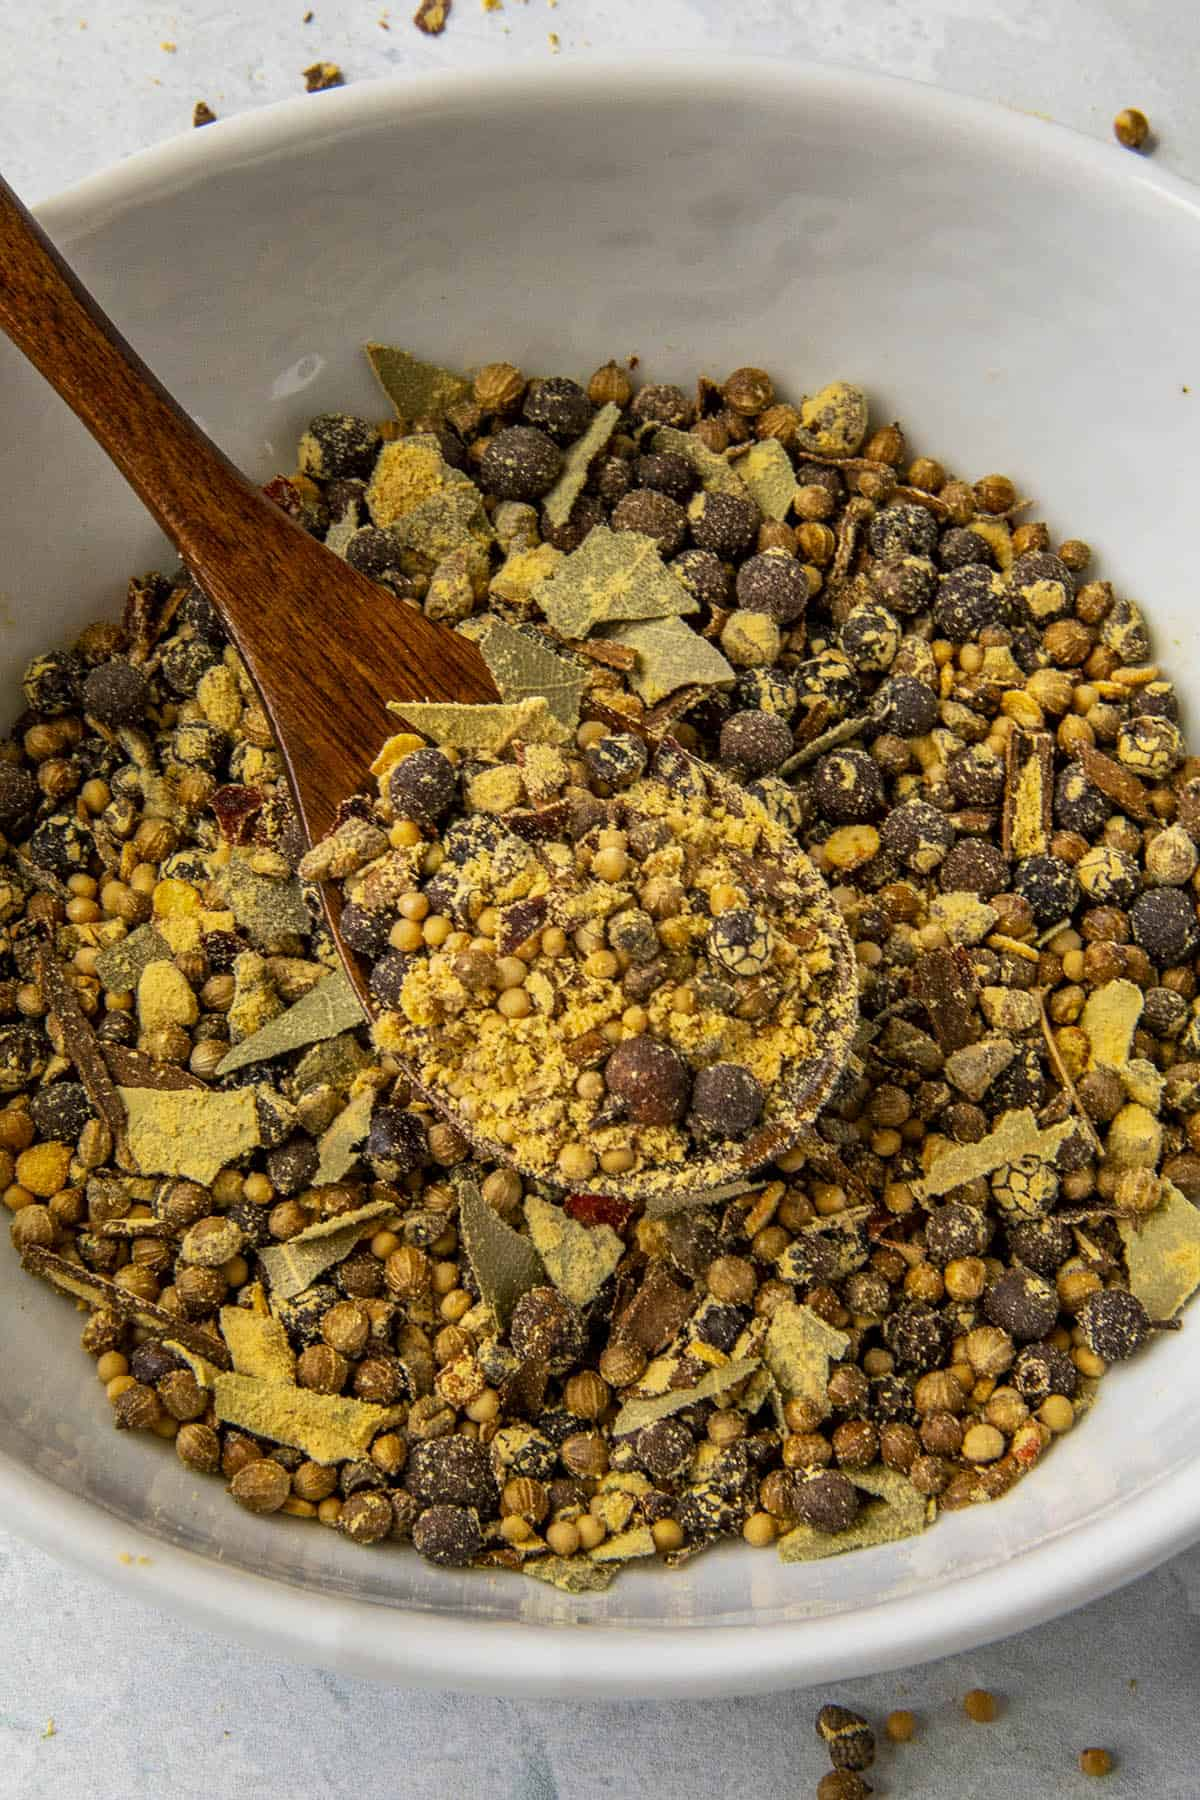 Homemade Pickling Spice Recipe